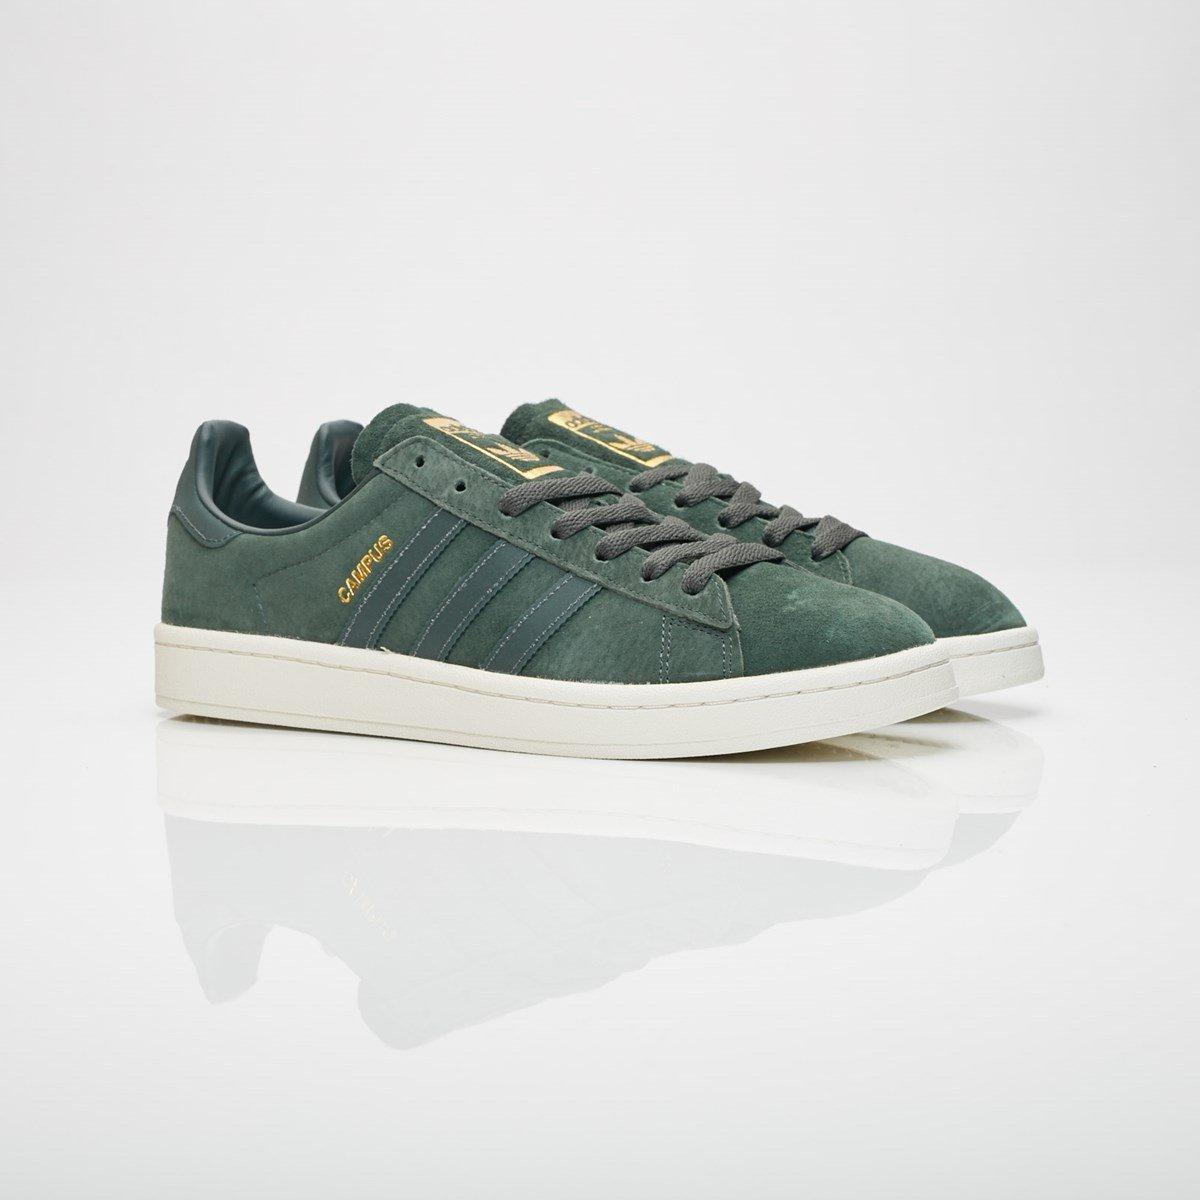 premium selection e3c47 f1d83 adidas campus bz0074 sneakers   streetwear på nätet sen 1999